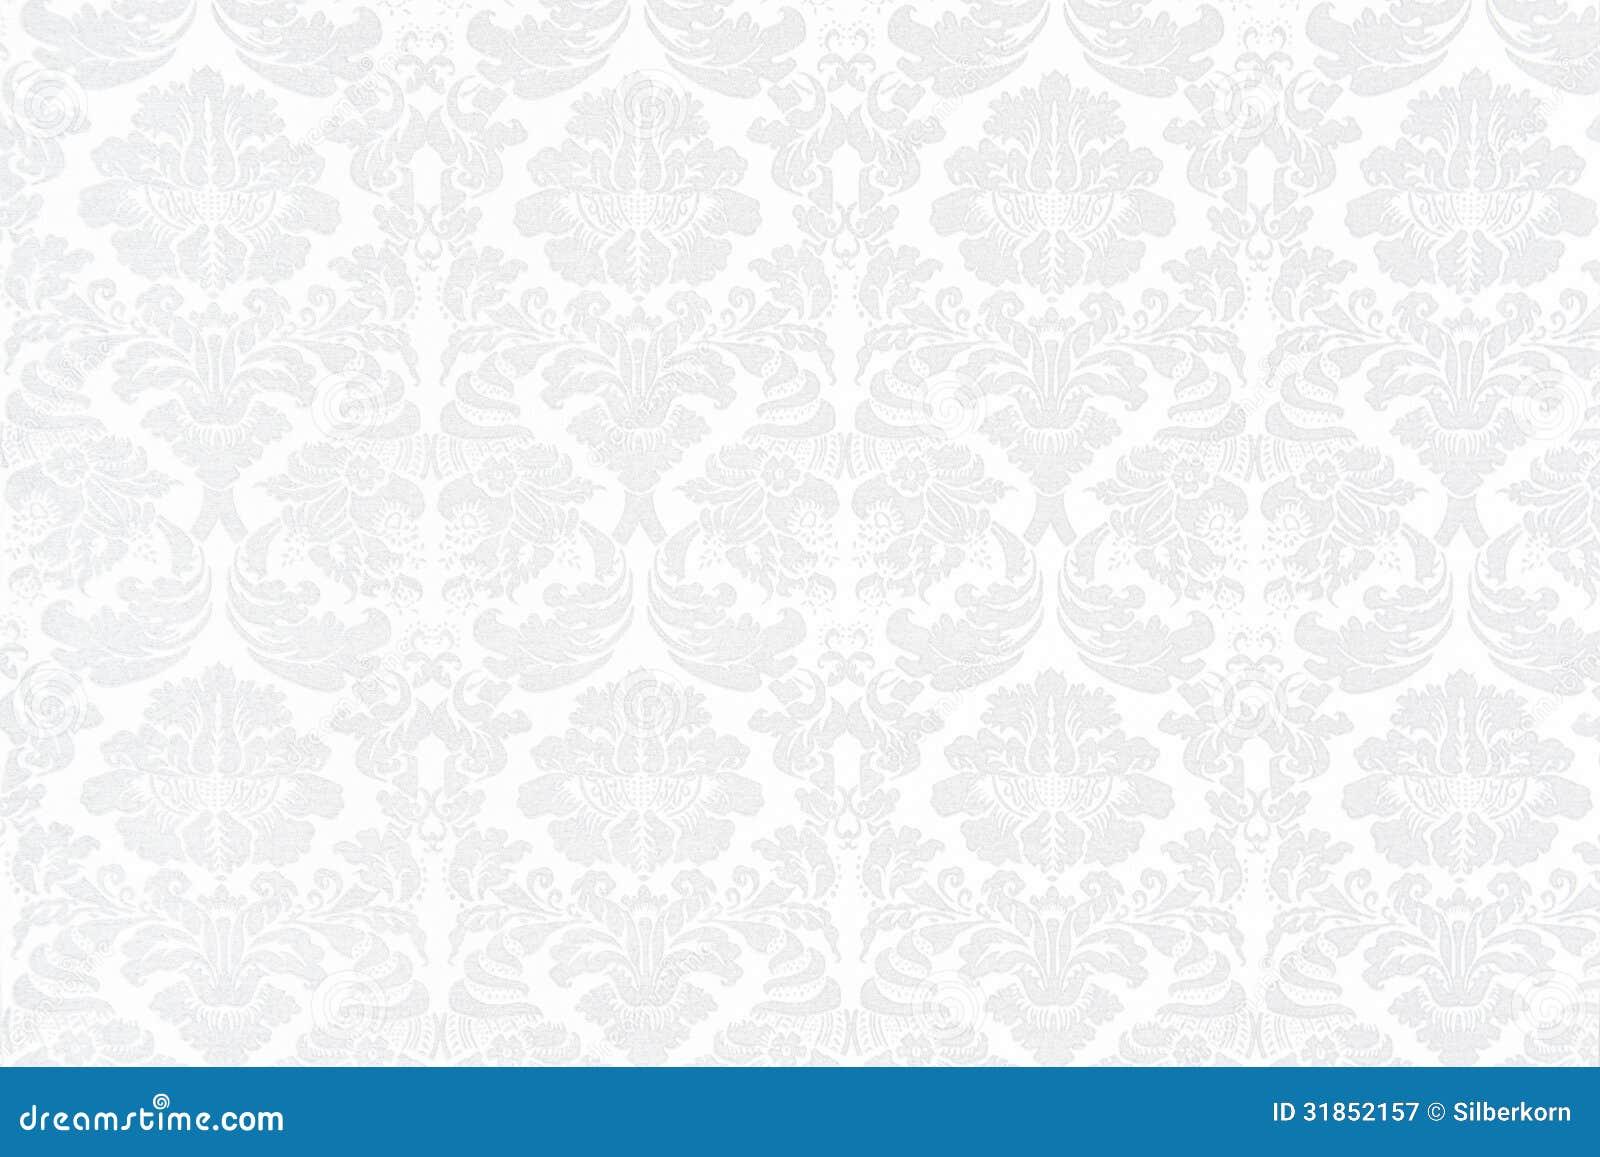 fond baroque blanc photographie stock libre de droits. Black Bedroom Furniture Sets. Home Design Ideas